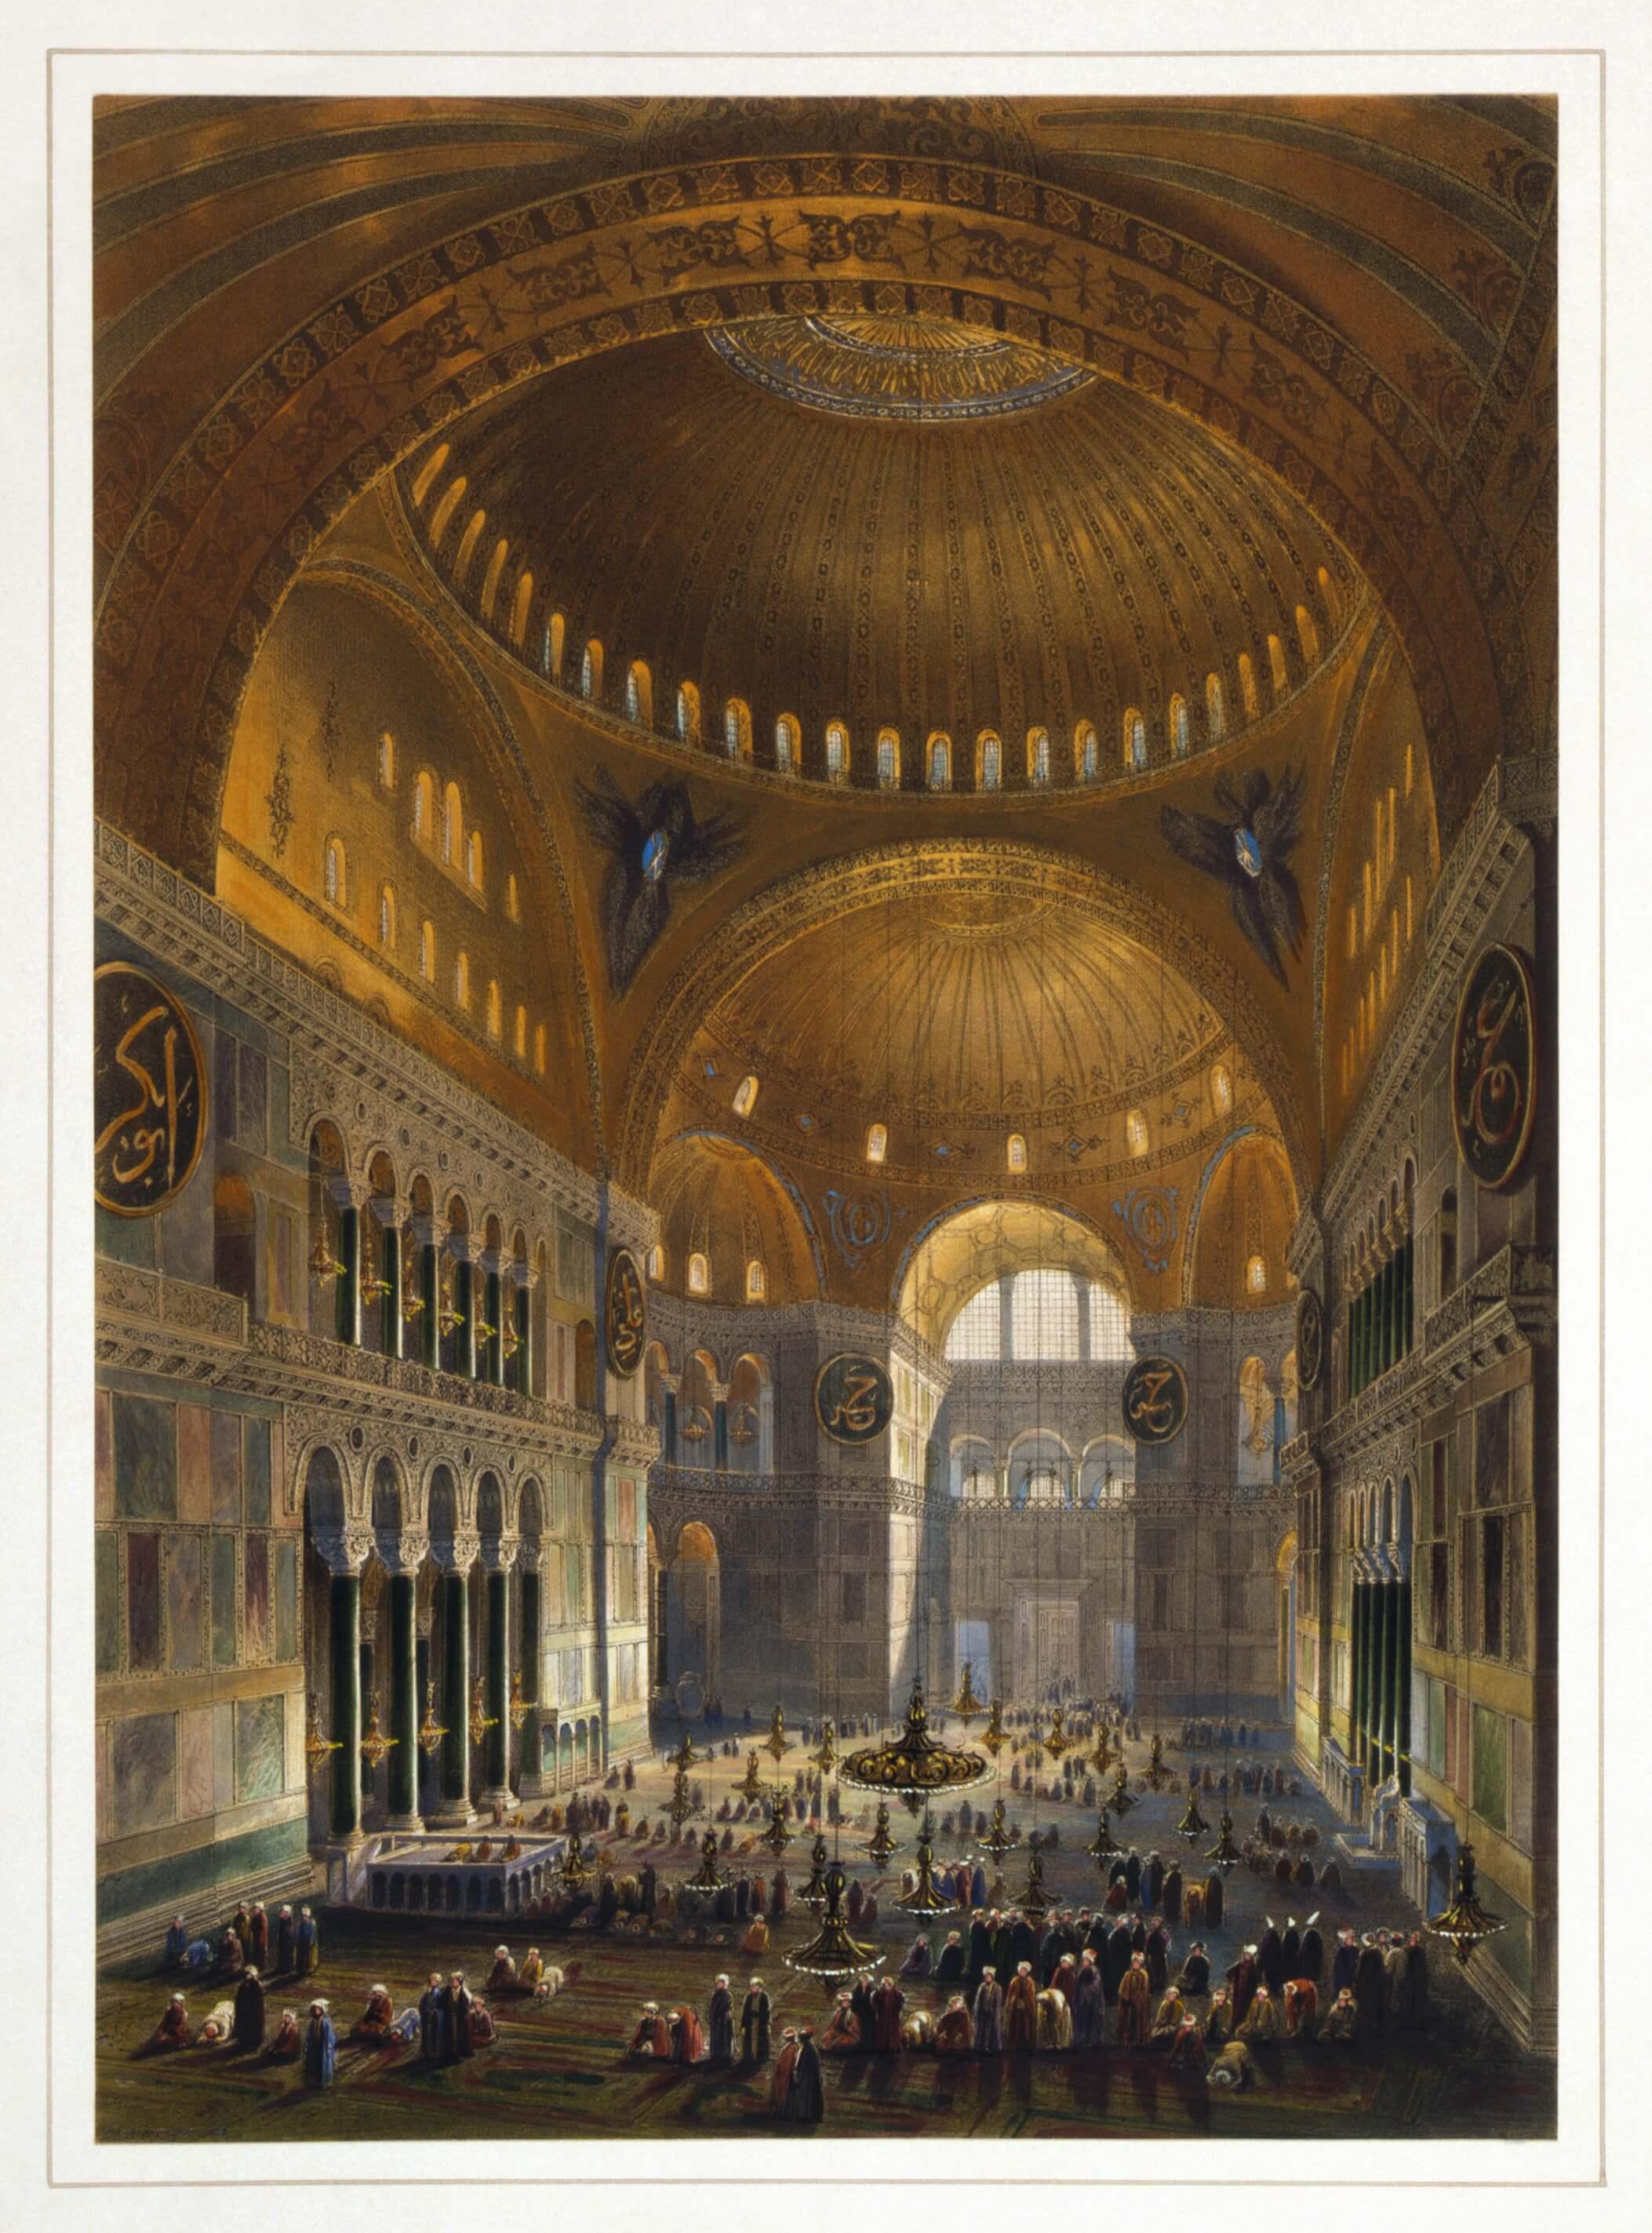 Hagia Sophia as a mosque